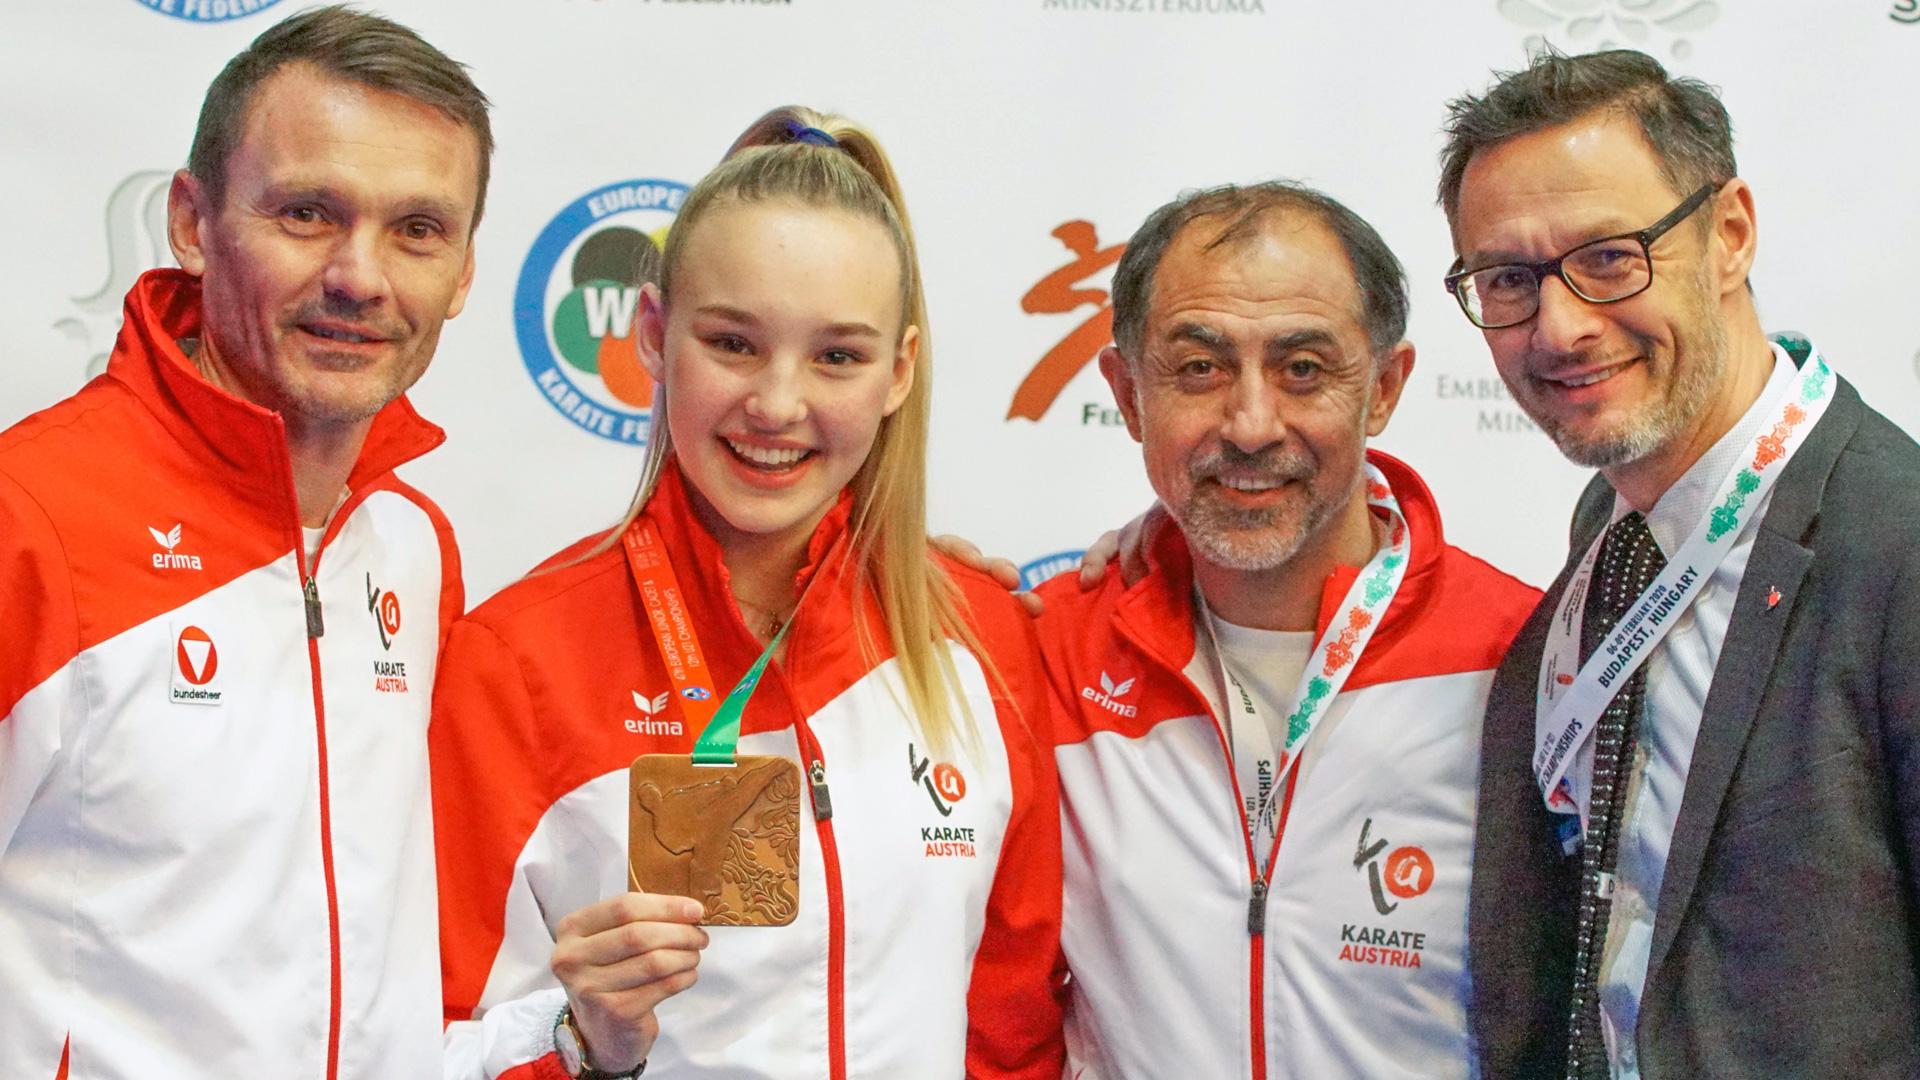 EKF | Europa Karate Meisterschaften | Hanna Devigili | Bronze | Karate Austria